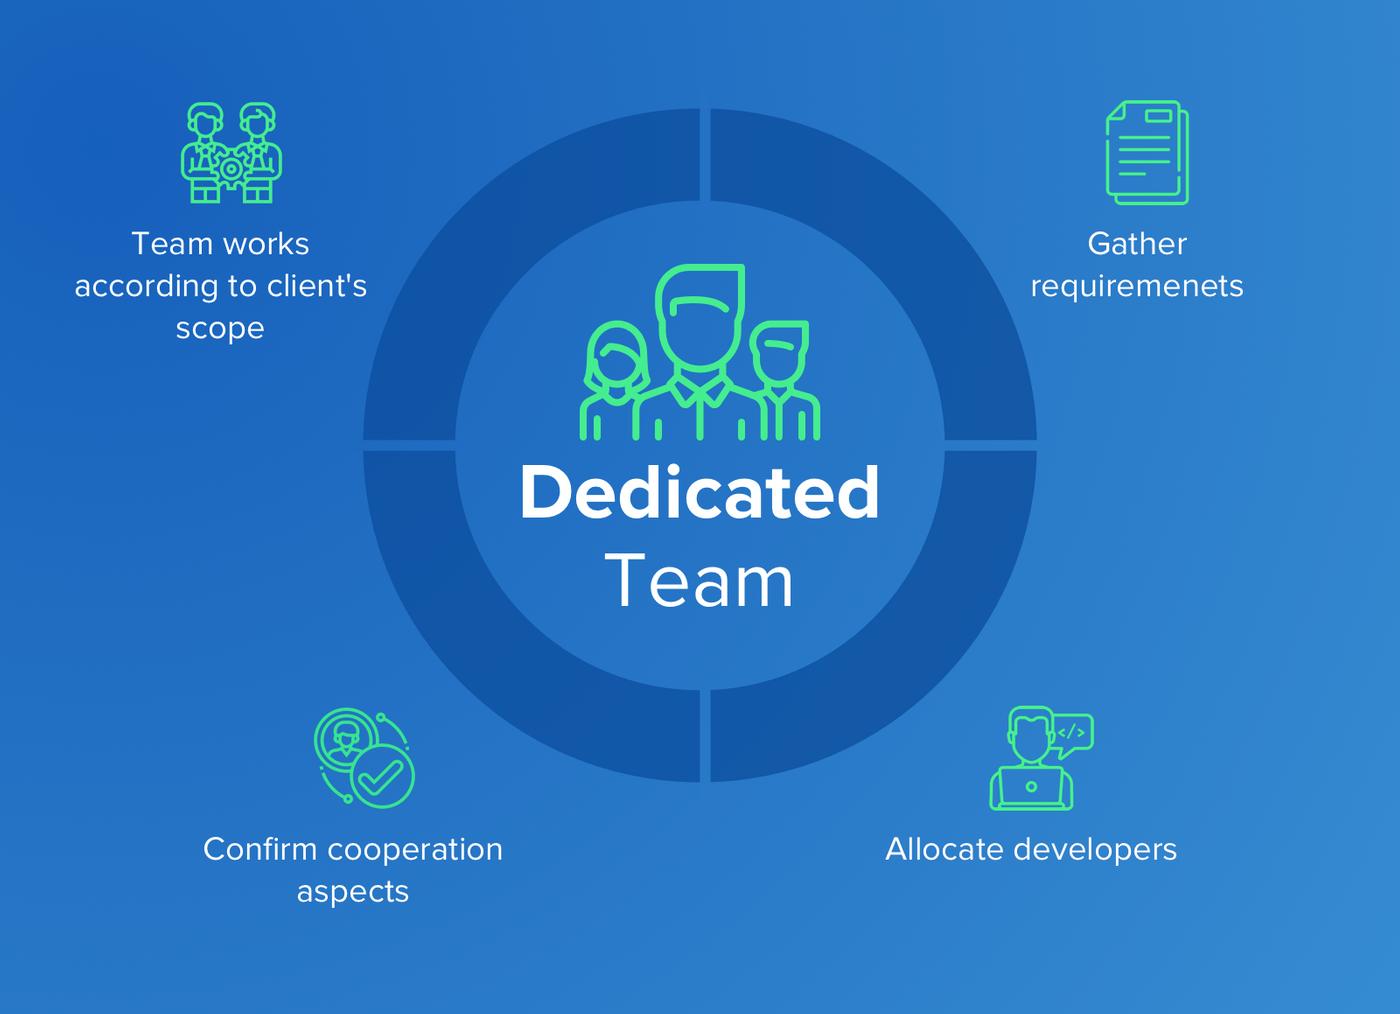 Dedicated team pricing model